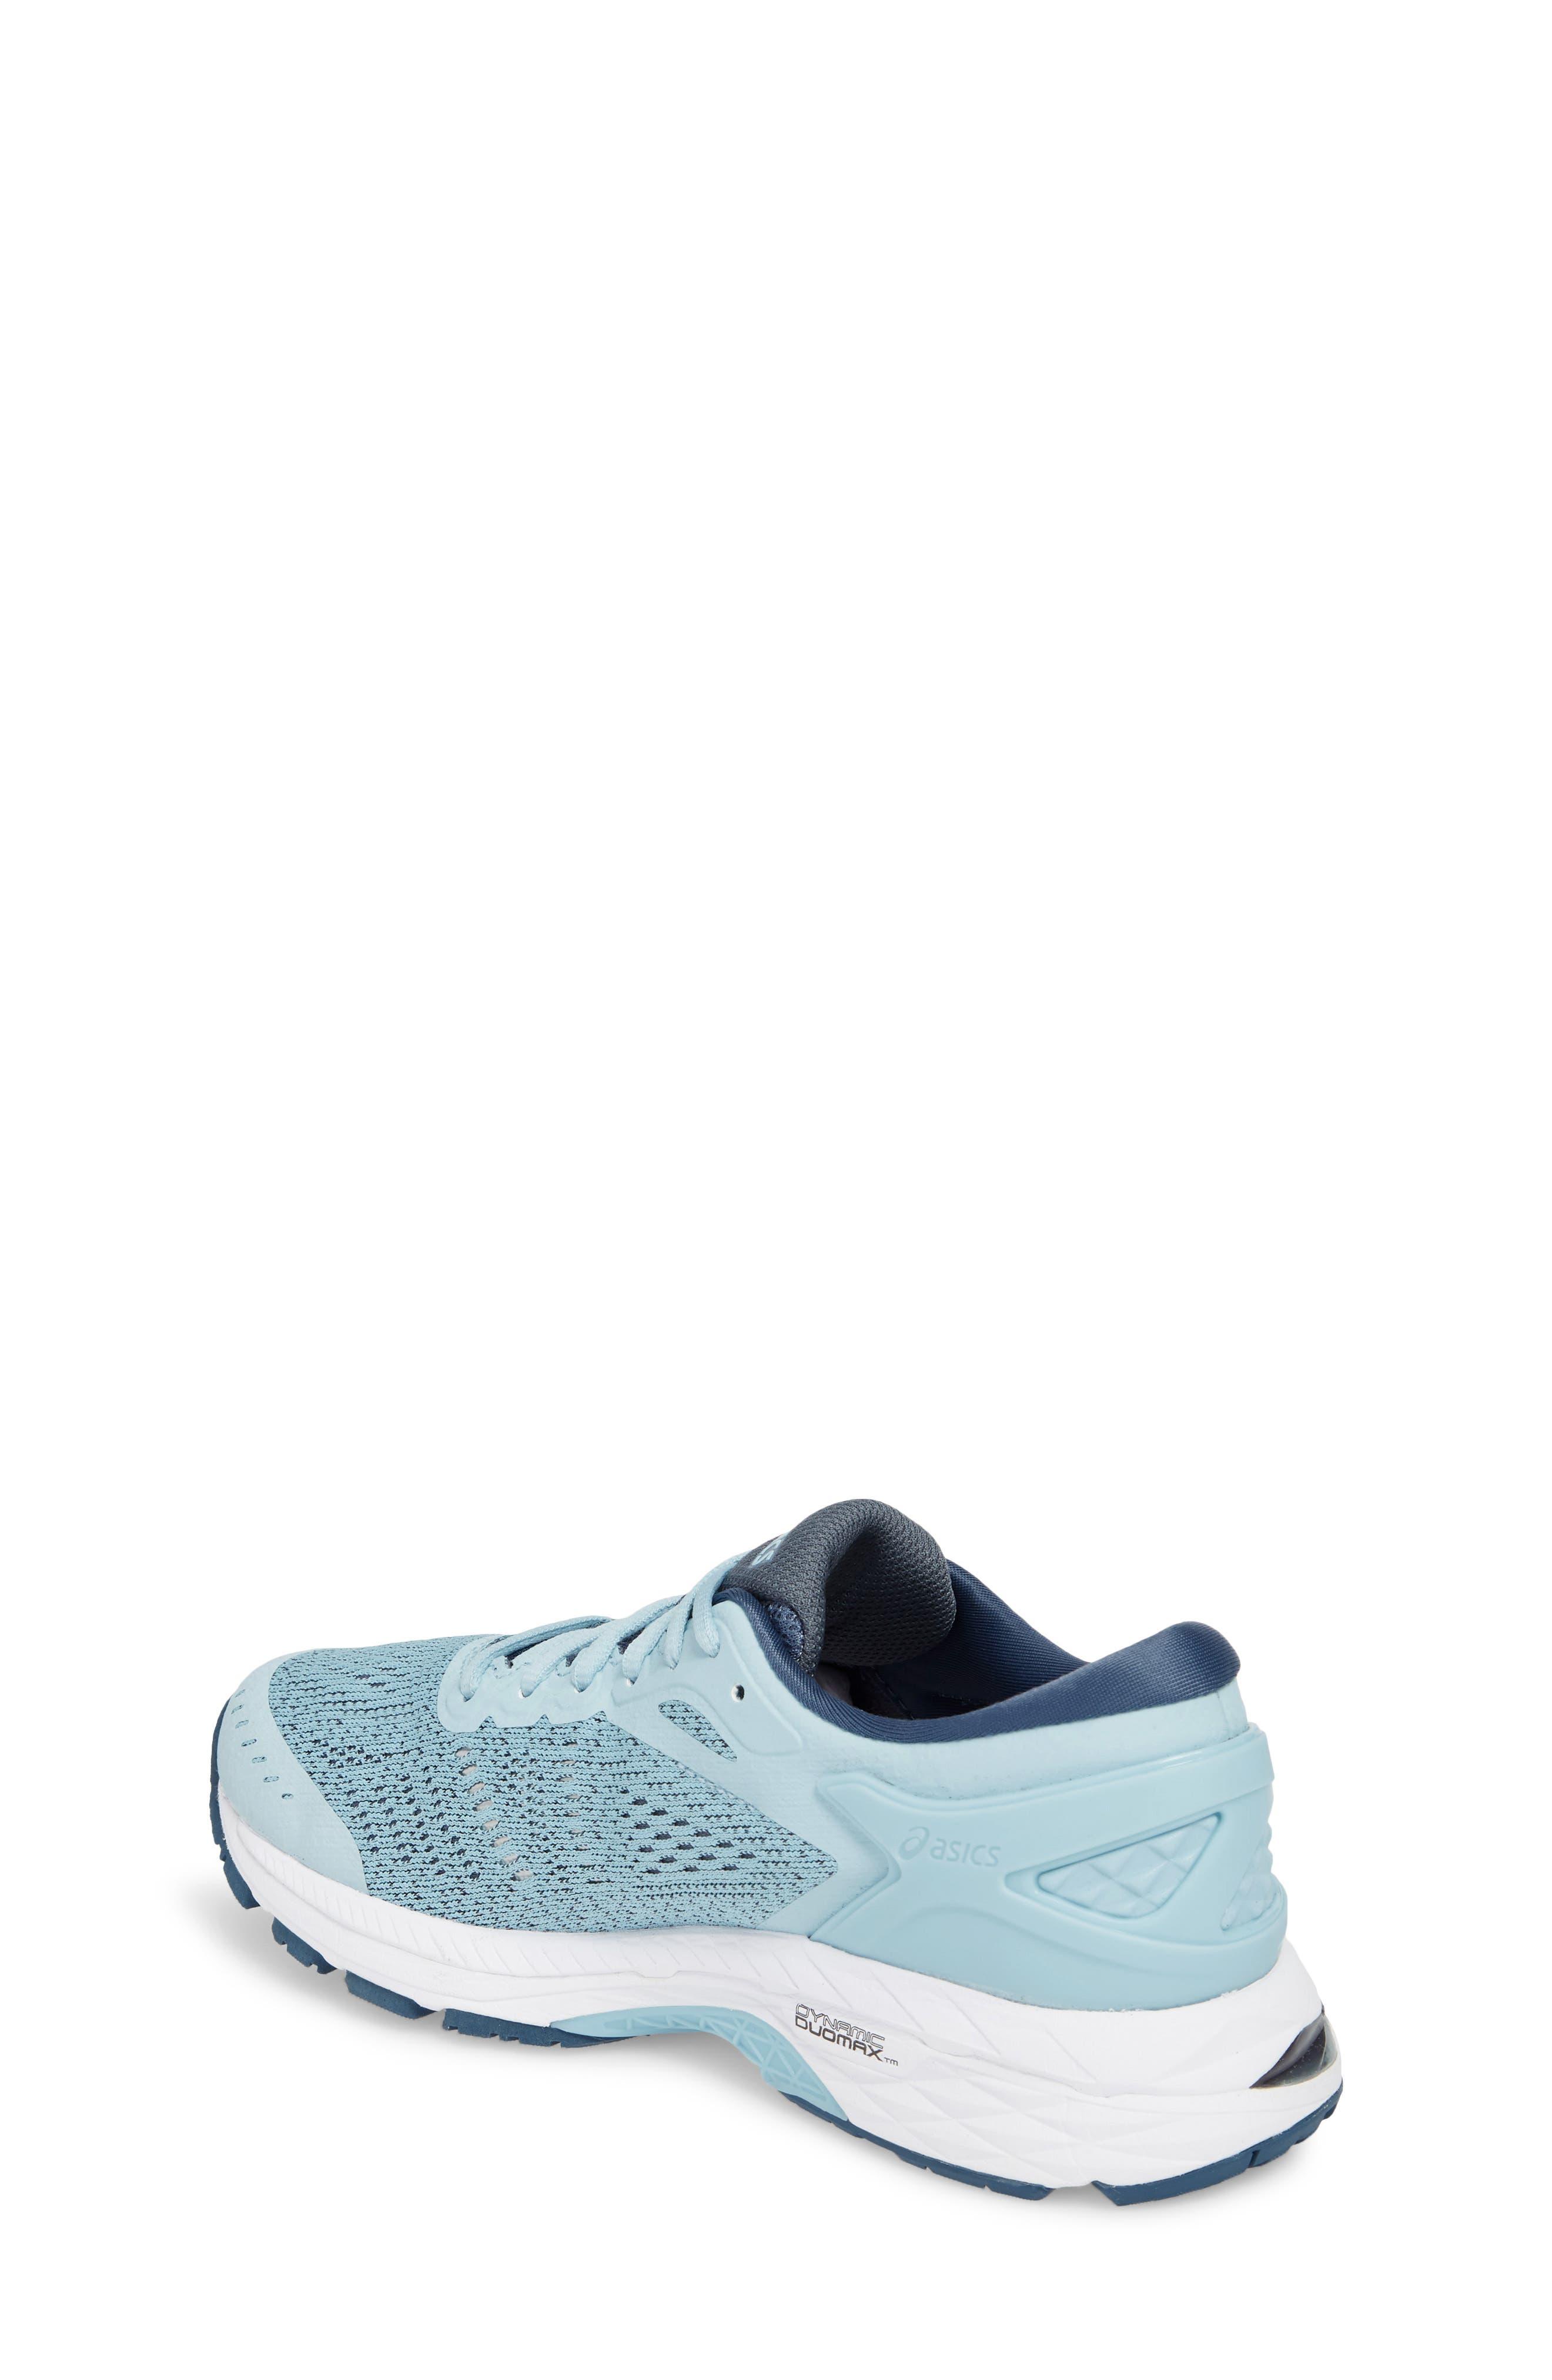 GEL-Kayano<sup>®</sup> 24 GS Running Shoe,                             Alternate thumbnail 4, color,